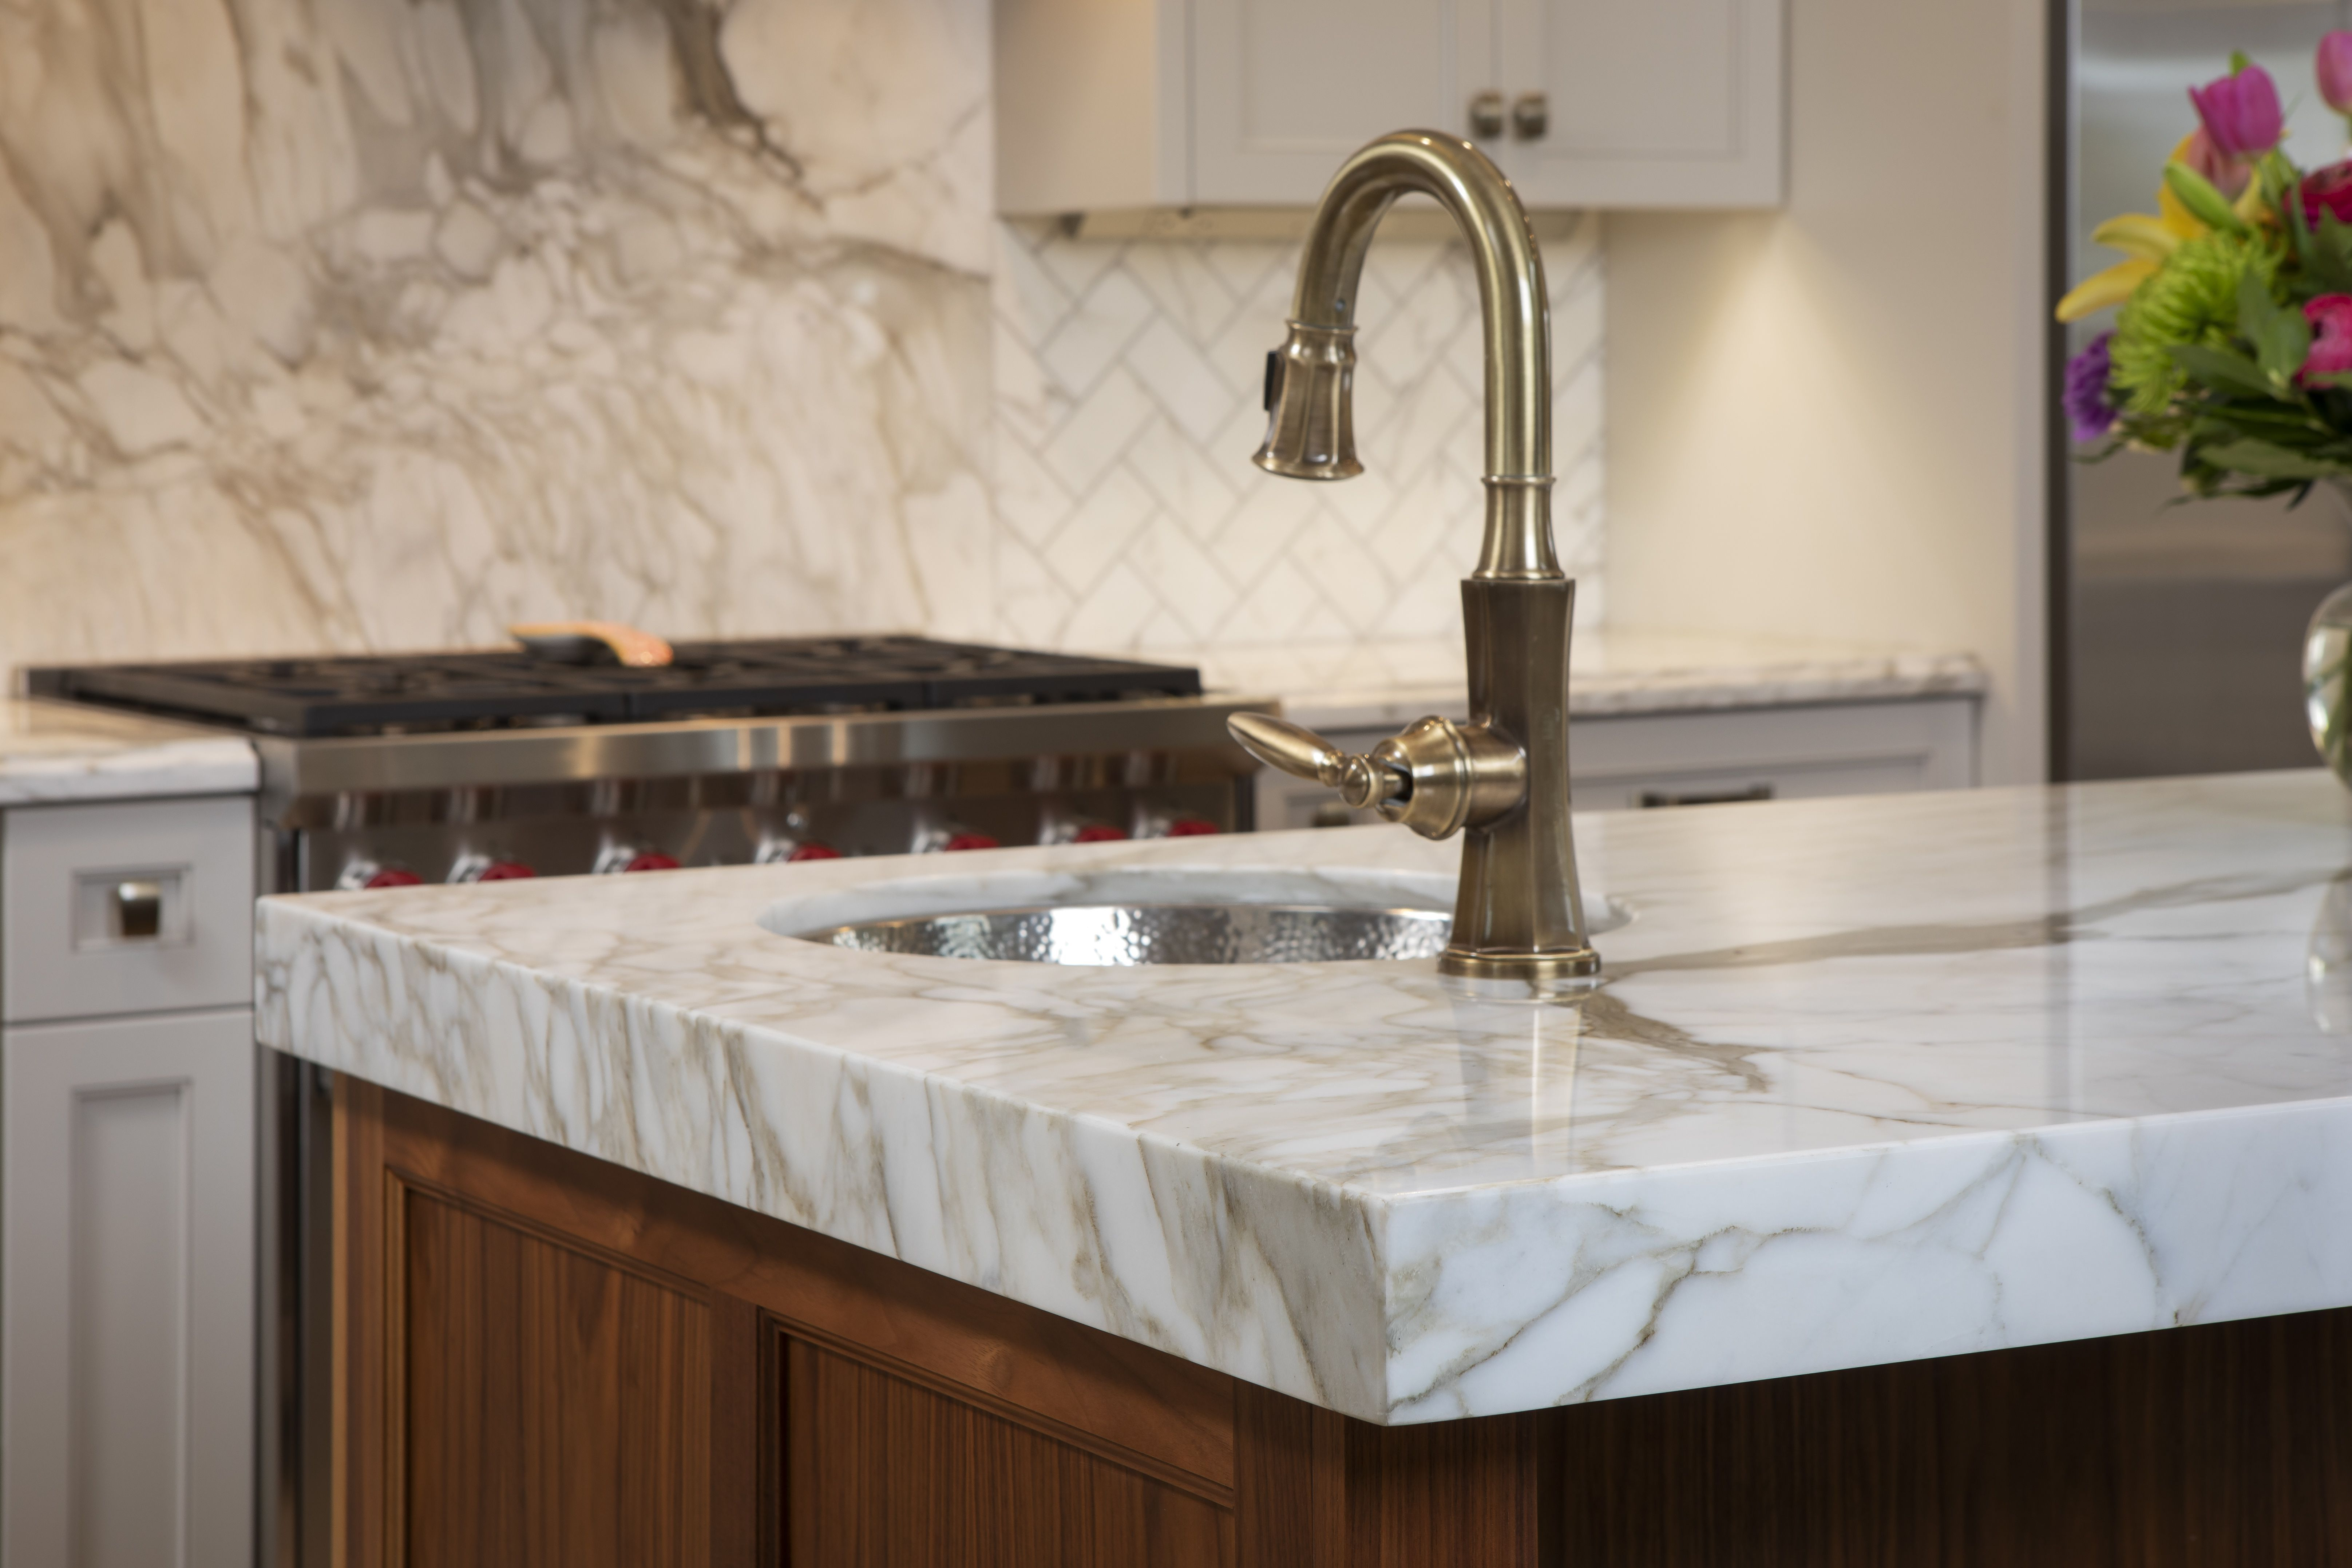 Quartz, Marble U0026 Granite Countertops In Toms River NJ ...